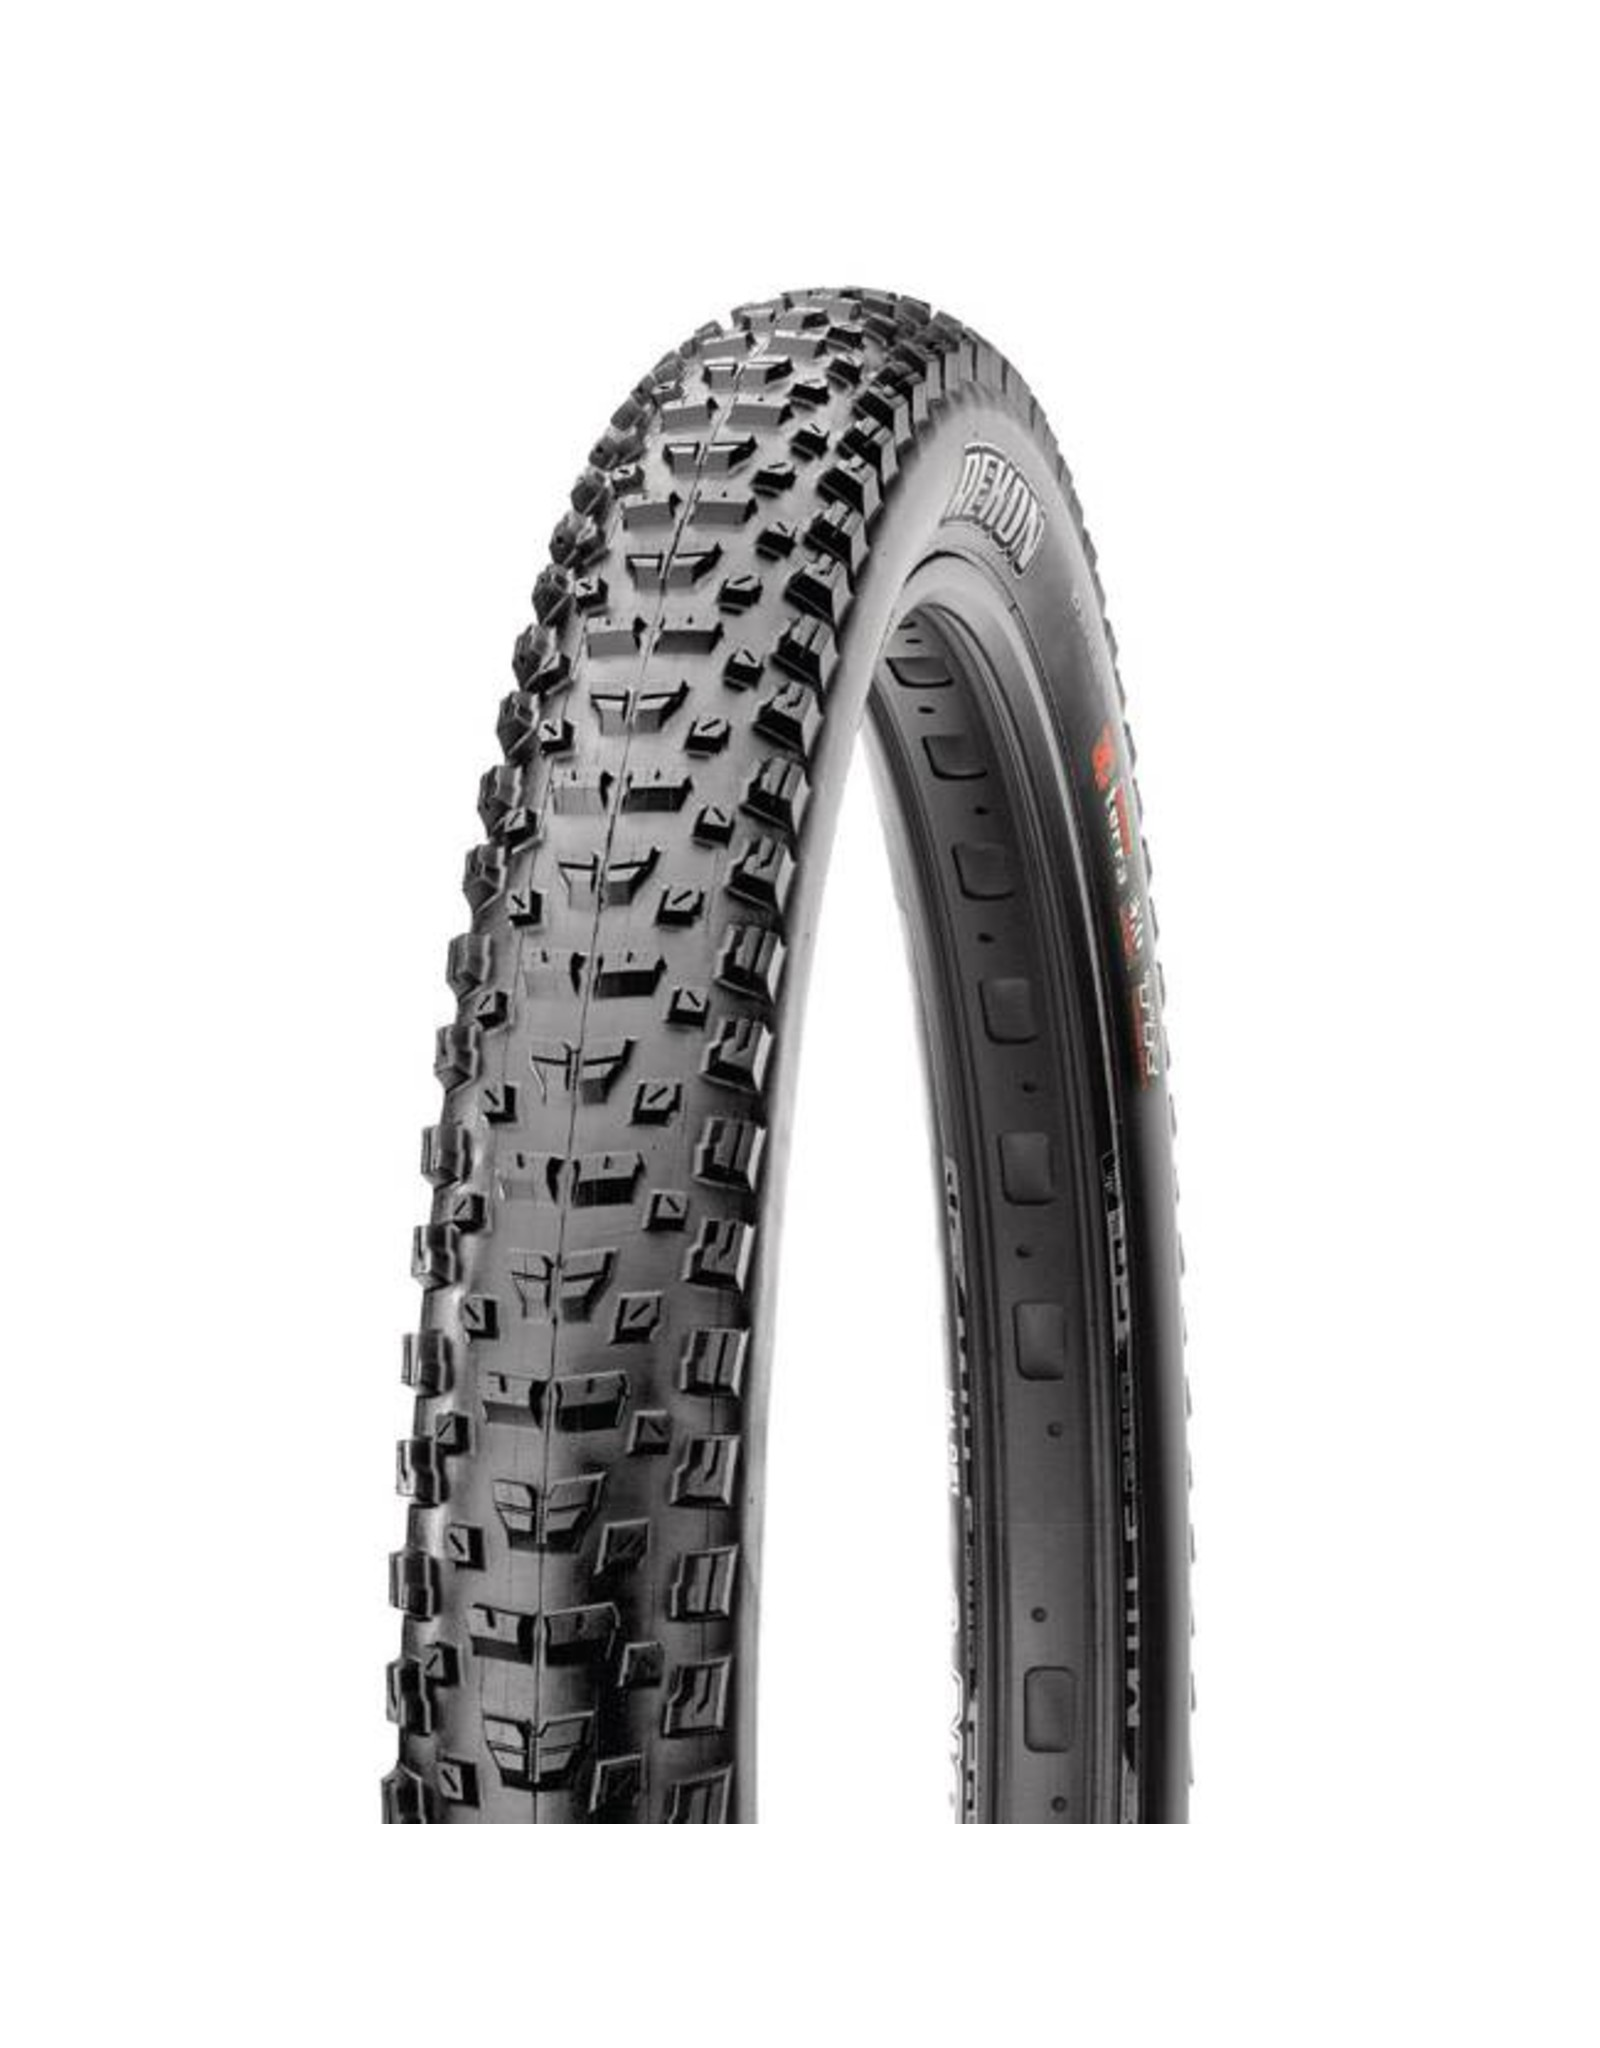 "Maxxis Maxxis Rekon Tire: 29 x 2.60"", Folding, 120tpi, 3C MaxxTerra, EXO, Tubeless Ready, Black"